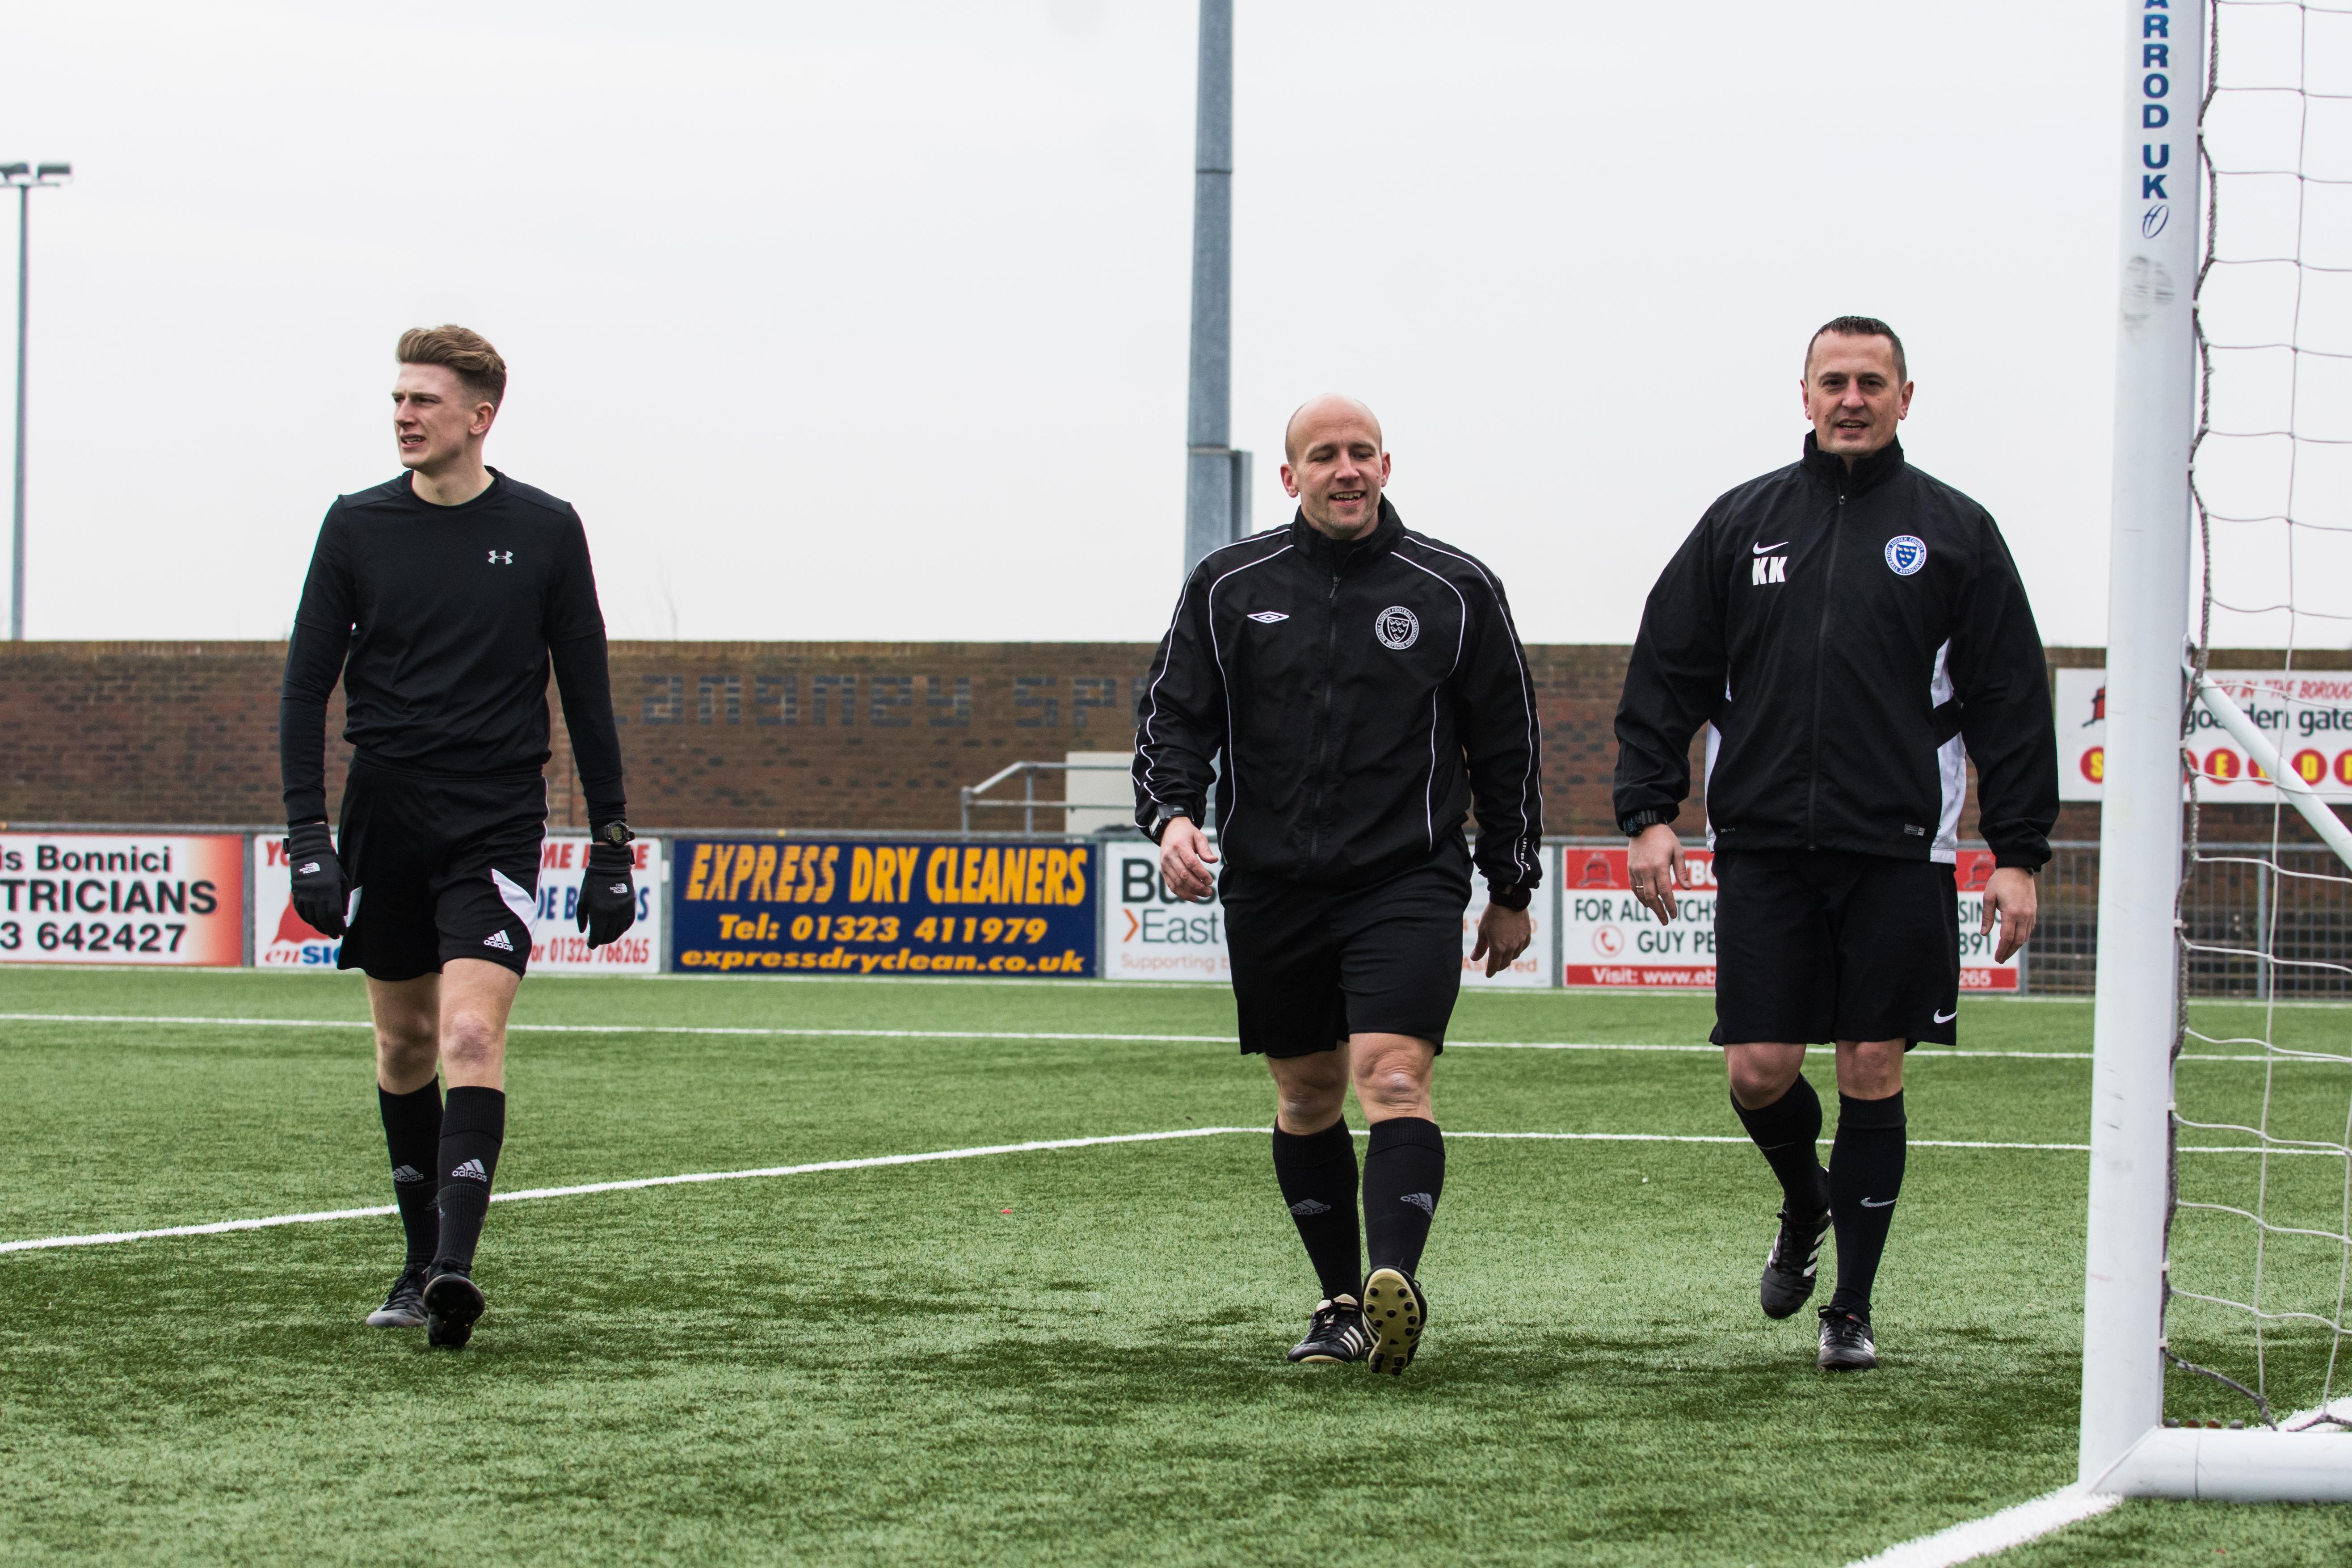 DAVID_JEFFERY Langney Wanderers FC vs Bexhill United FC 03.03.18 24